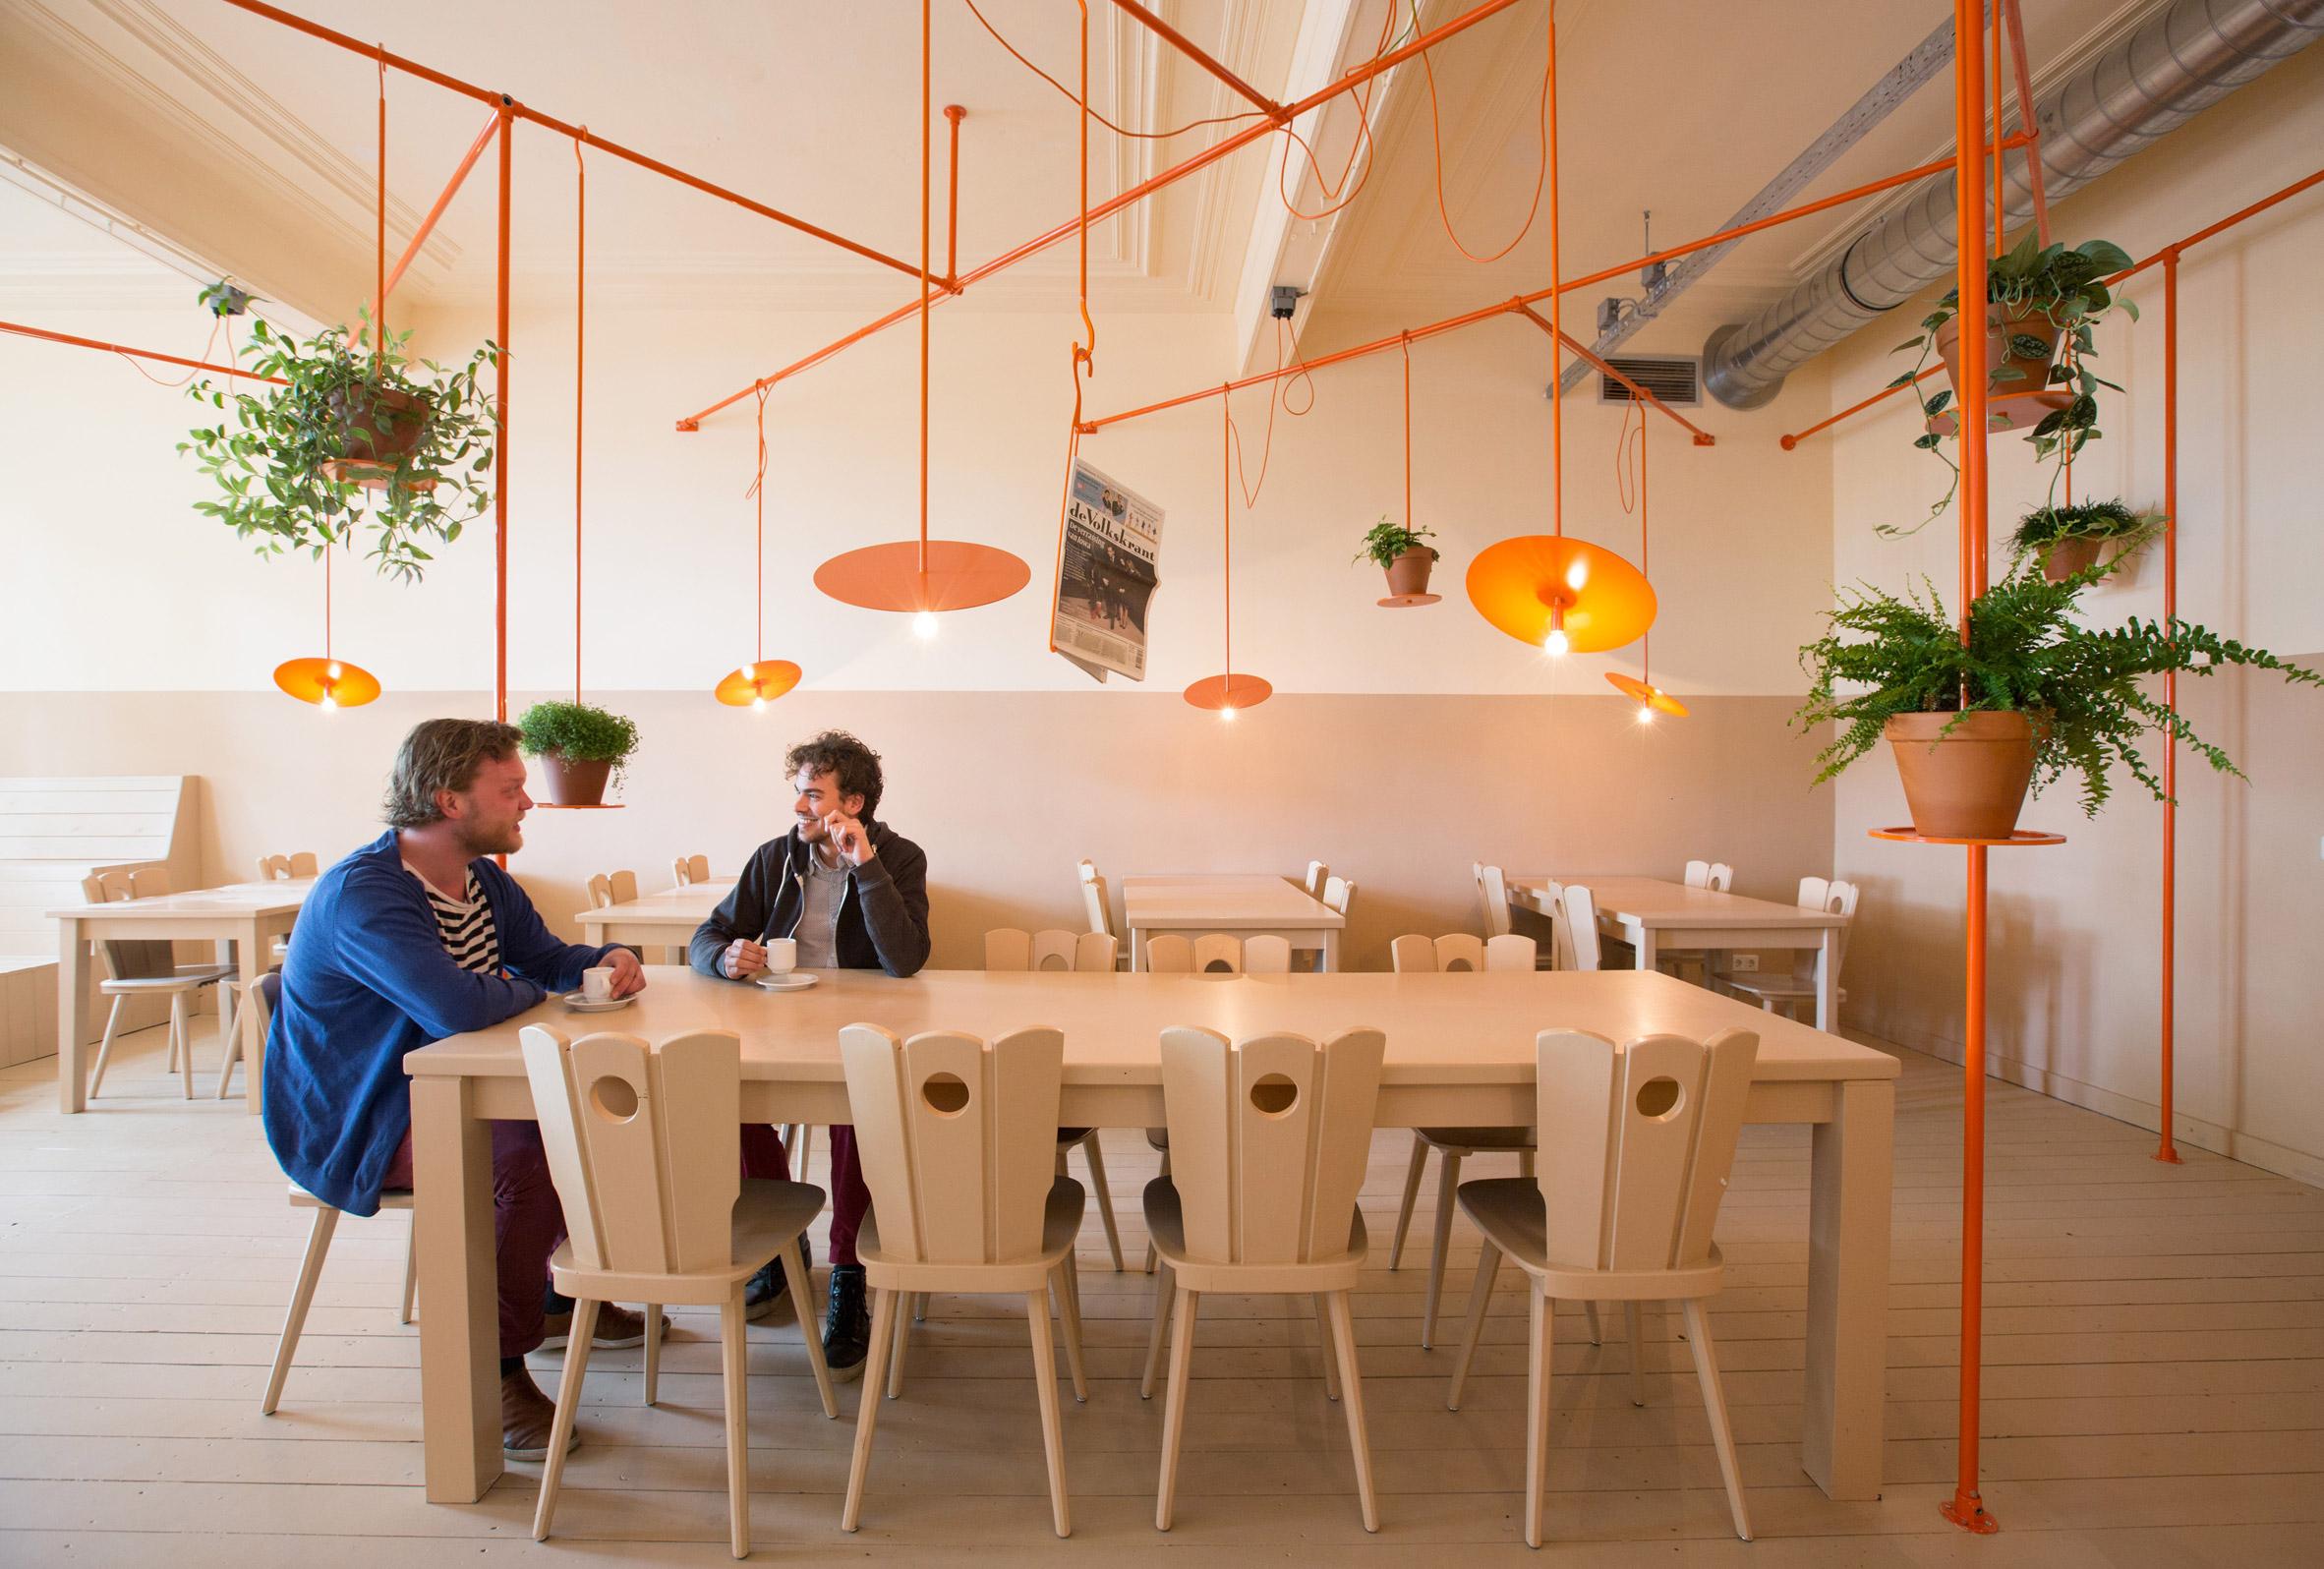 hangop-bar-concert-hall-cafe-renovation-refurbishment-interior-design-overtreders-w-the-netherlands_dezeen_2364_col_1